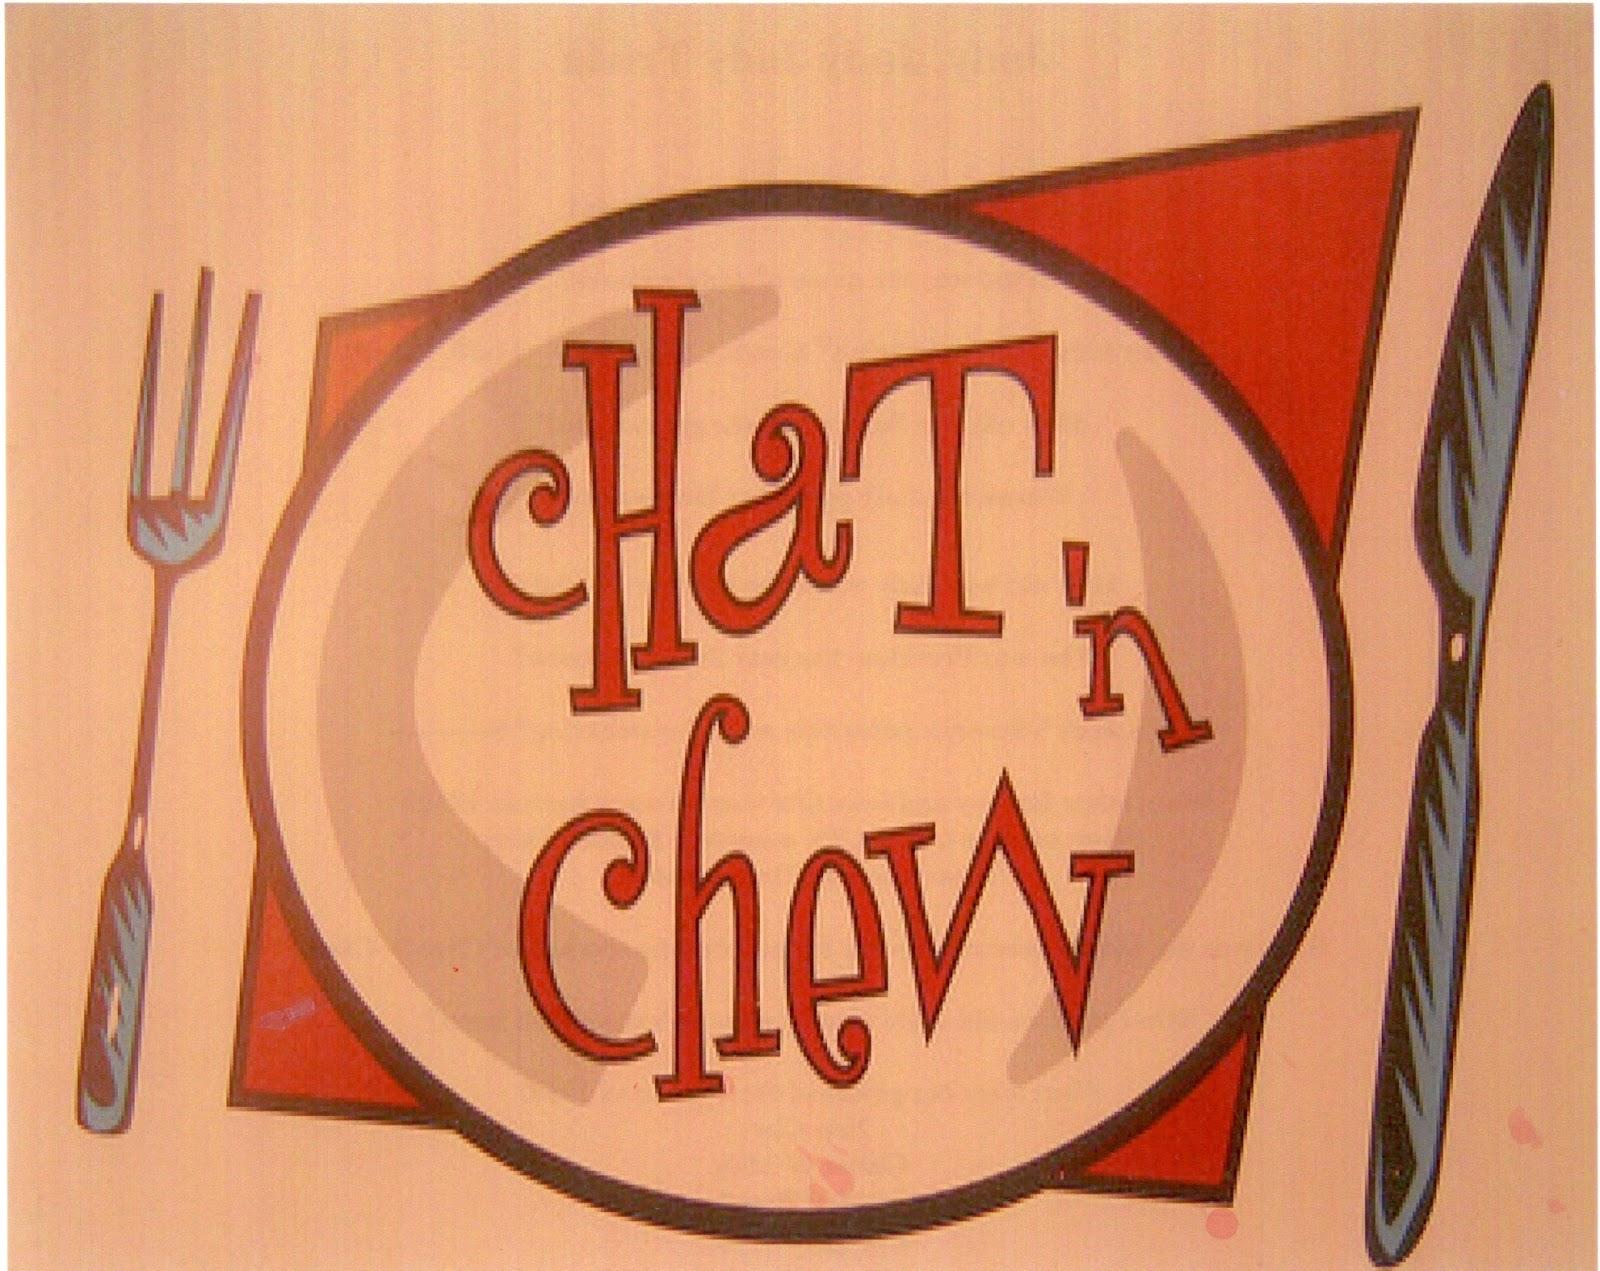 slacker chat n chew